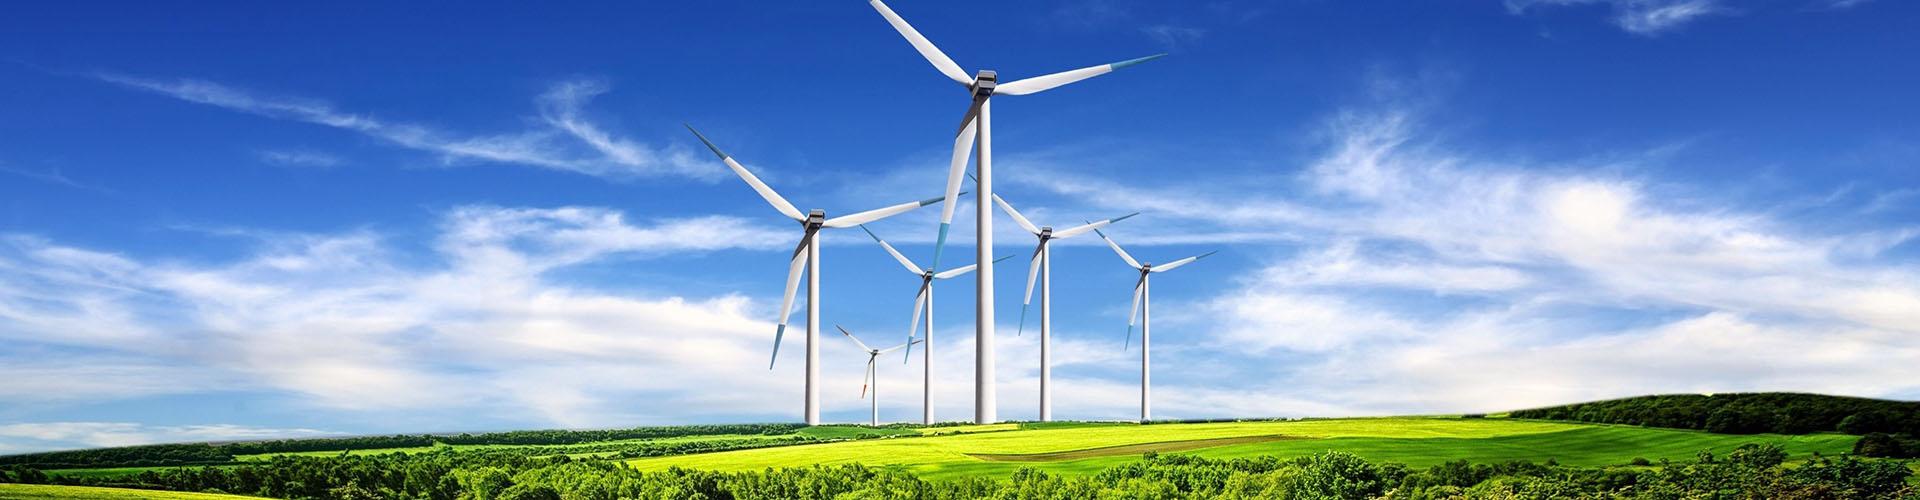 Průmysl a energetika